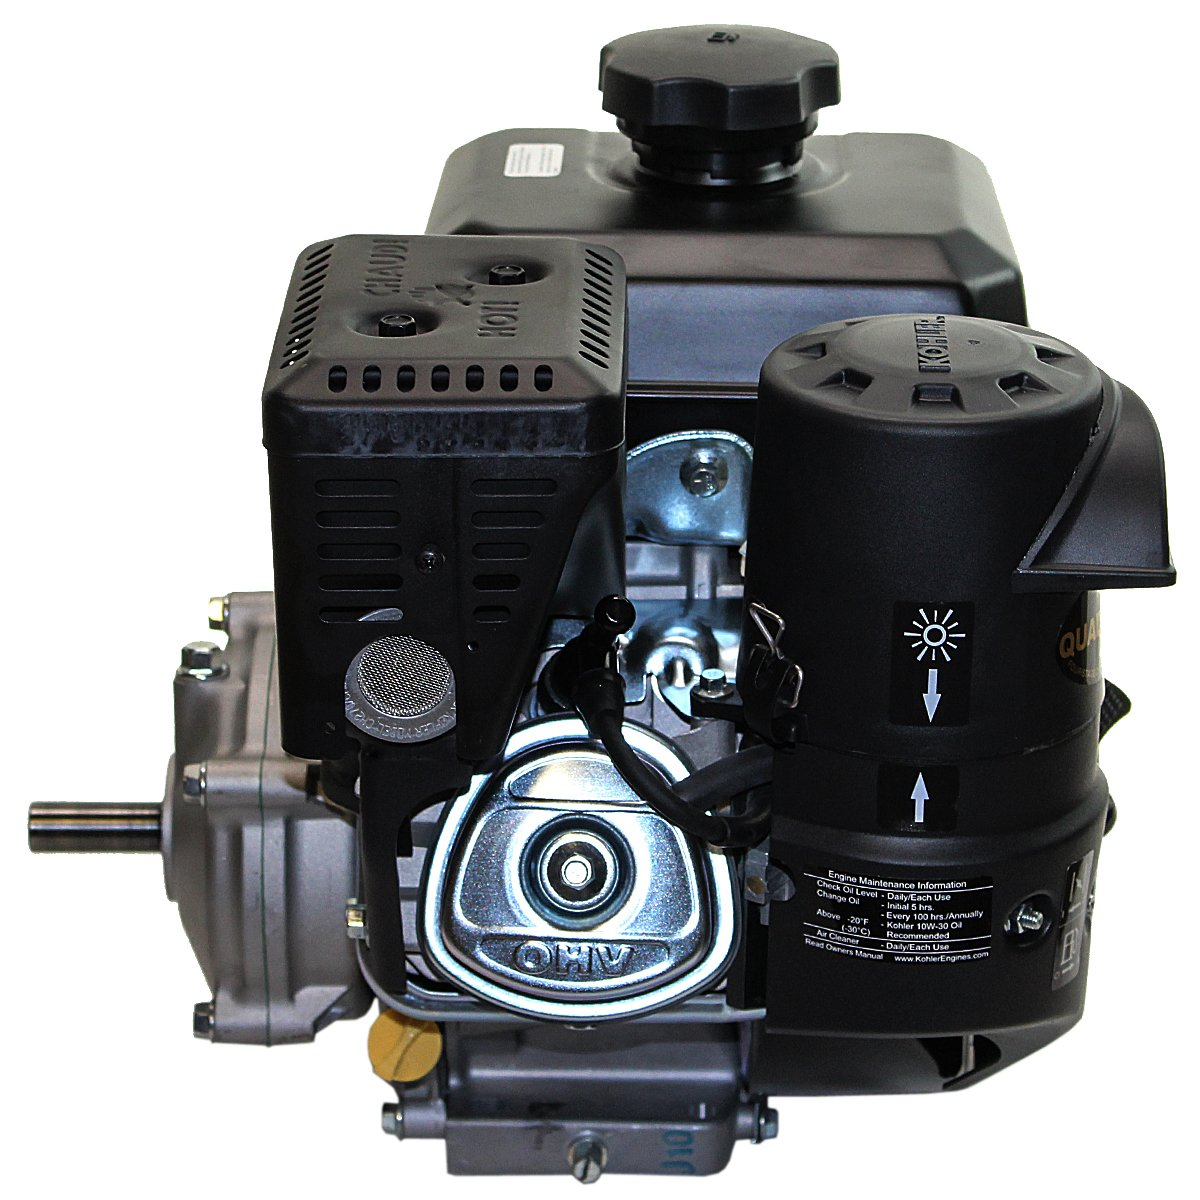 Kohler 7hp Command Pro 61 Gear Reduction 3 4x2 Keyed 2 7 Engine Schematics Shaft Recoil Start Cis Ohv Fuel Tank Muffler Home Kitchen